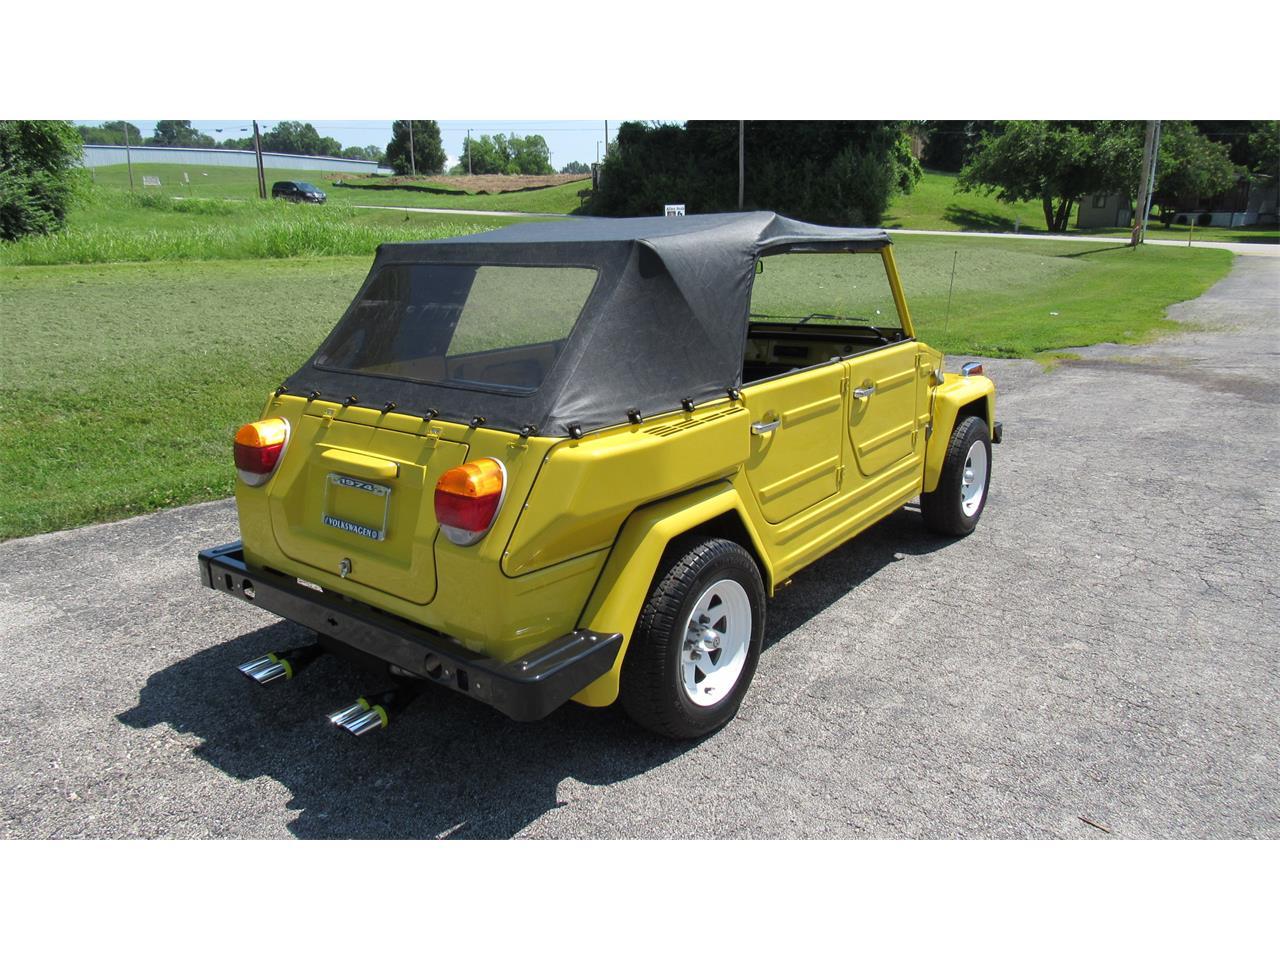 1974 Volkswagen Thing (CC-1233666) for sale in WASHINGTON, Missouri